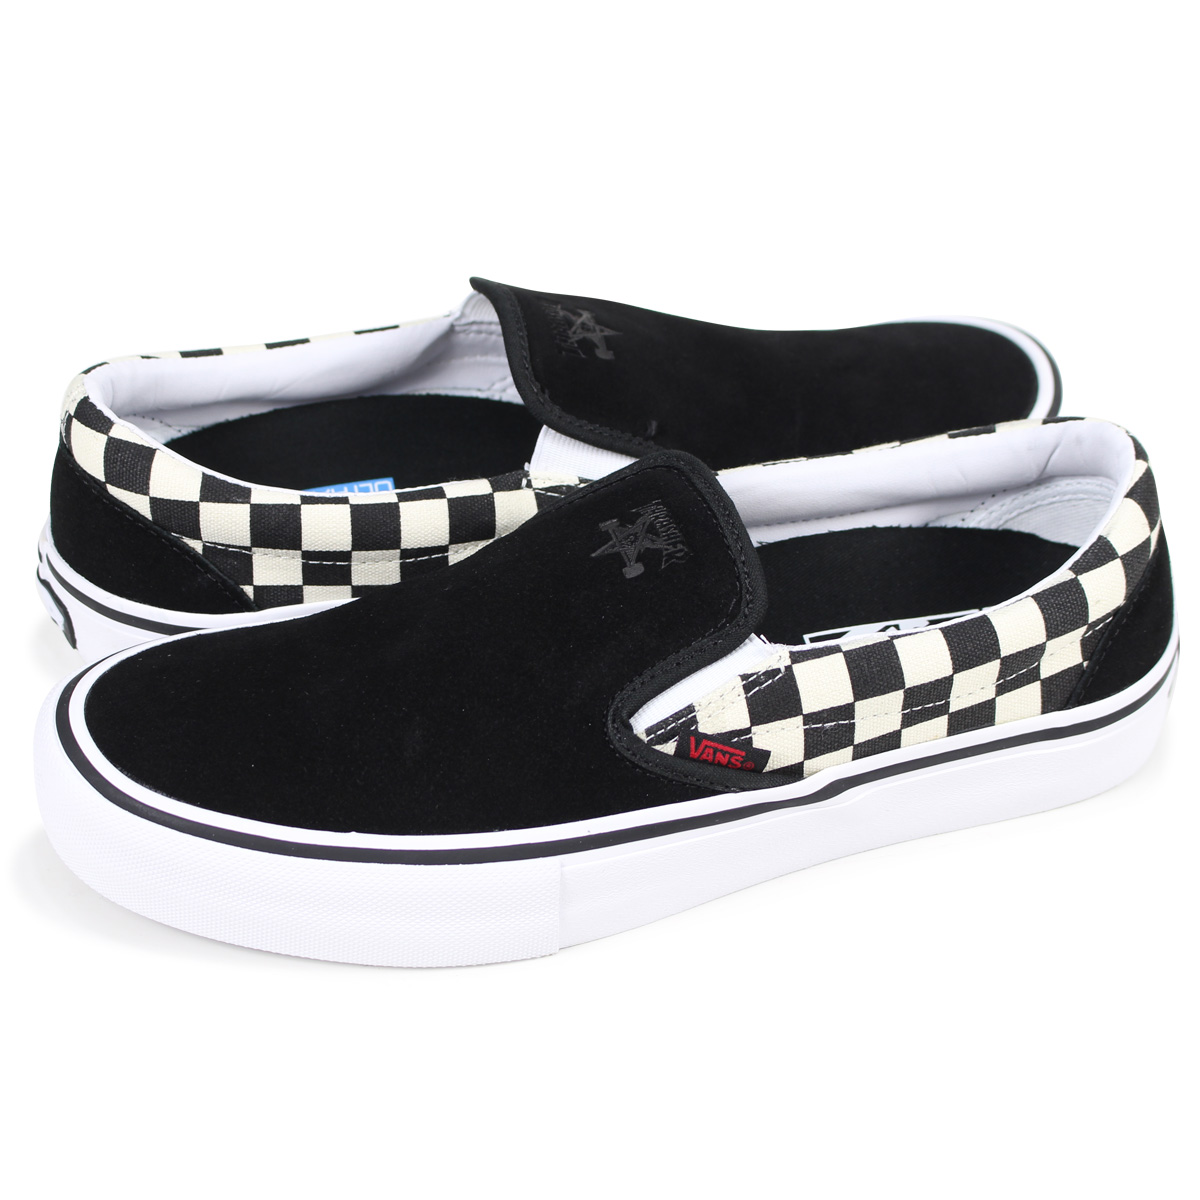 1bf7b98ca974b4 Whats up Sports  VANS THRASHER SLIP-ON PRO slasher slip-ons sneakers ...